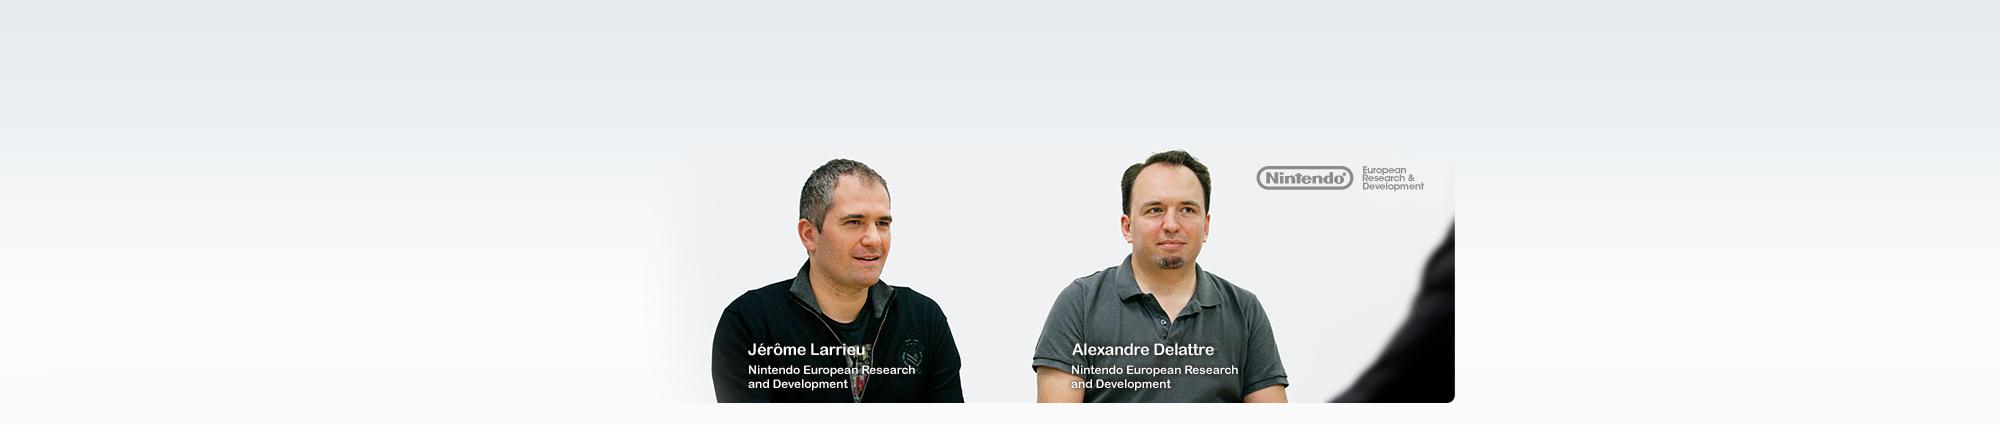 NERD Nintendo European Research & Development